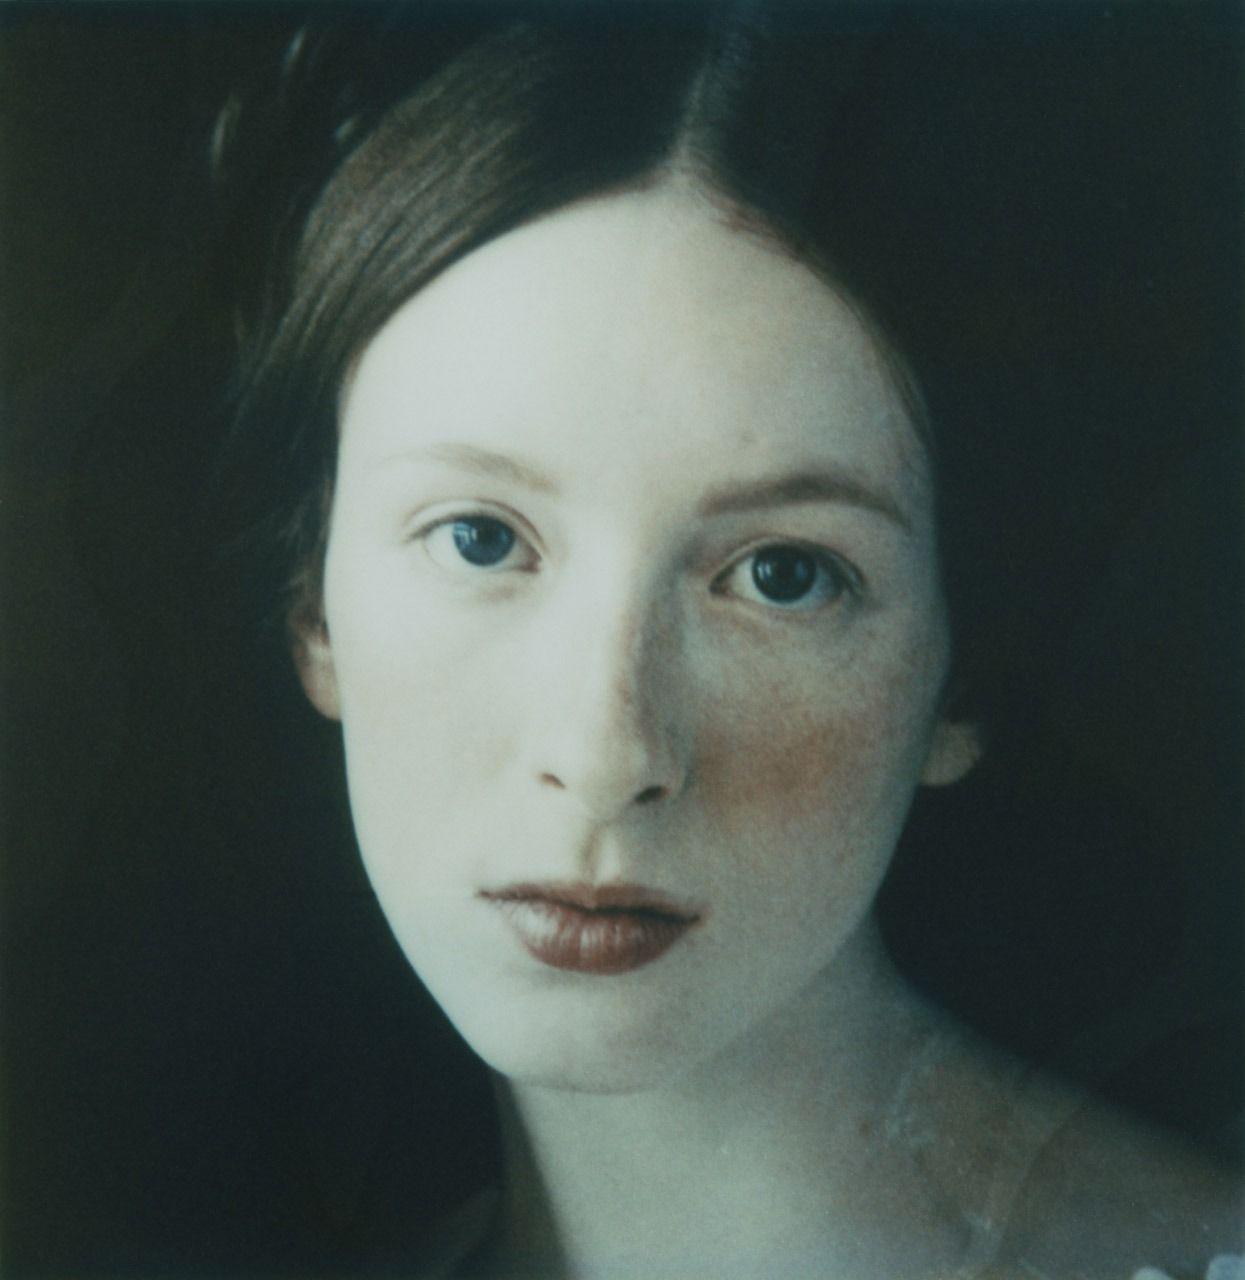 Photo by Sibylle Bergemann (German photographer, 1941 – 2010), from The Polaroids series